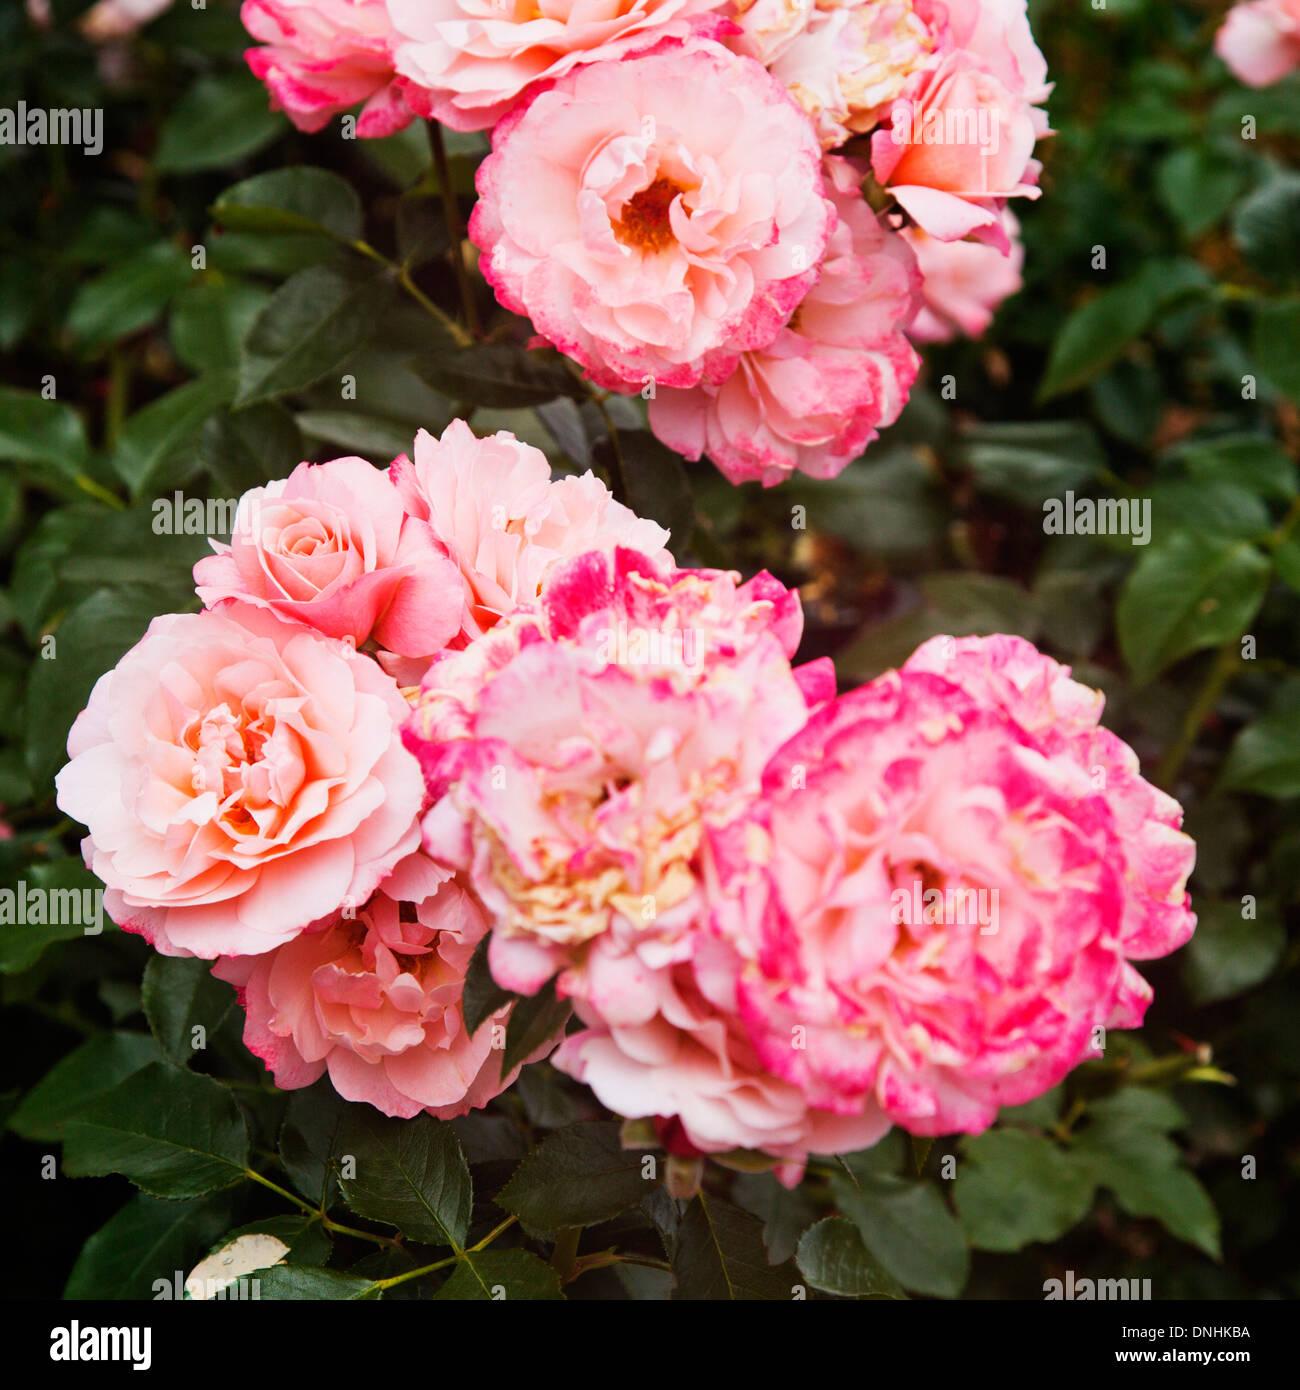 Close-up of Rose flowers, Villa Cimbrone, Ravello, Province of Salerno, Campania, Italy Stock Photo